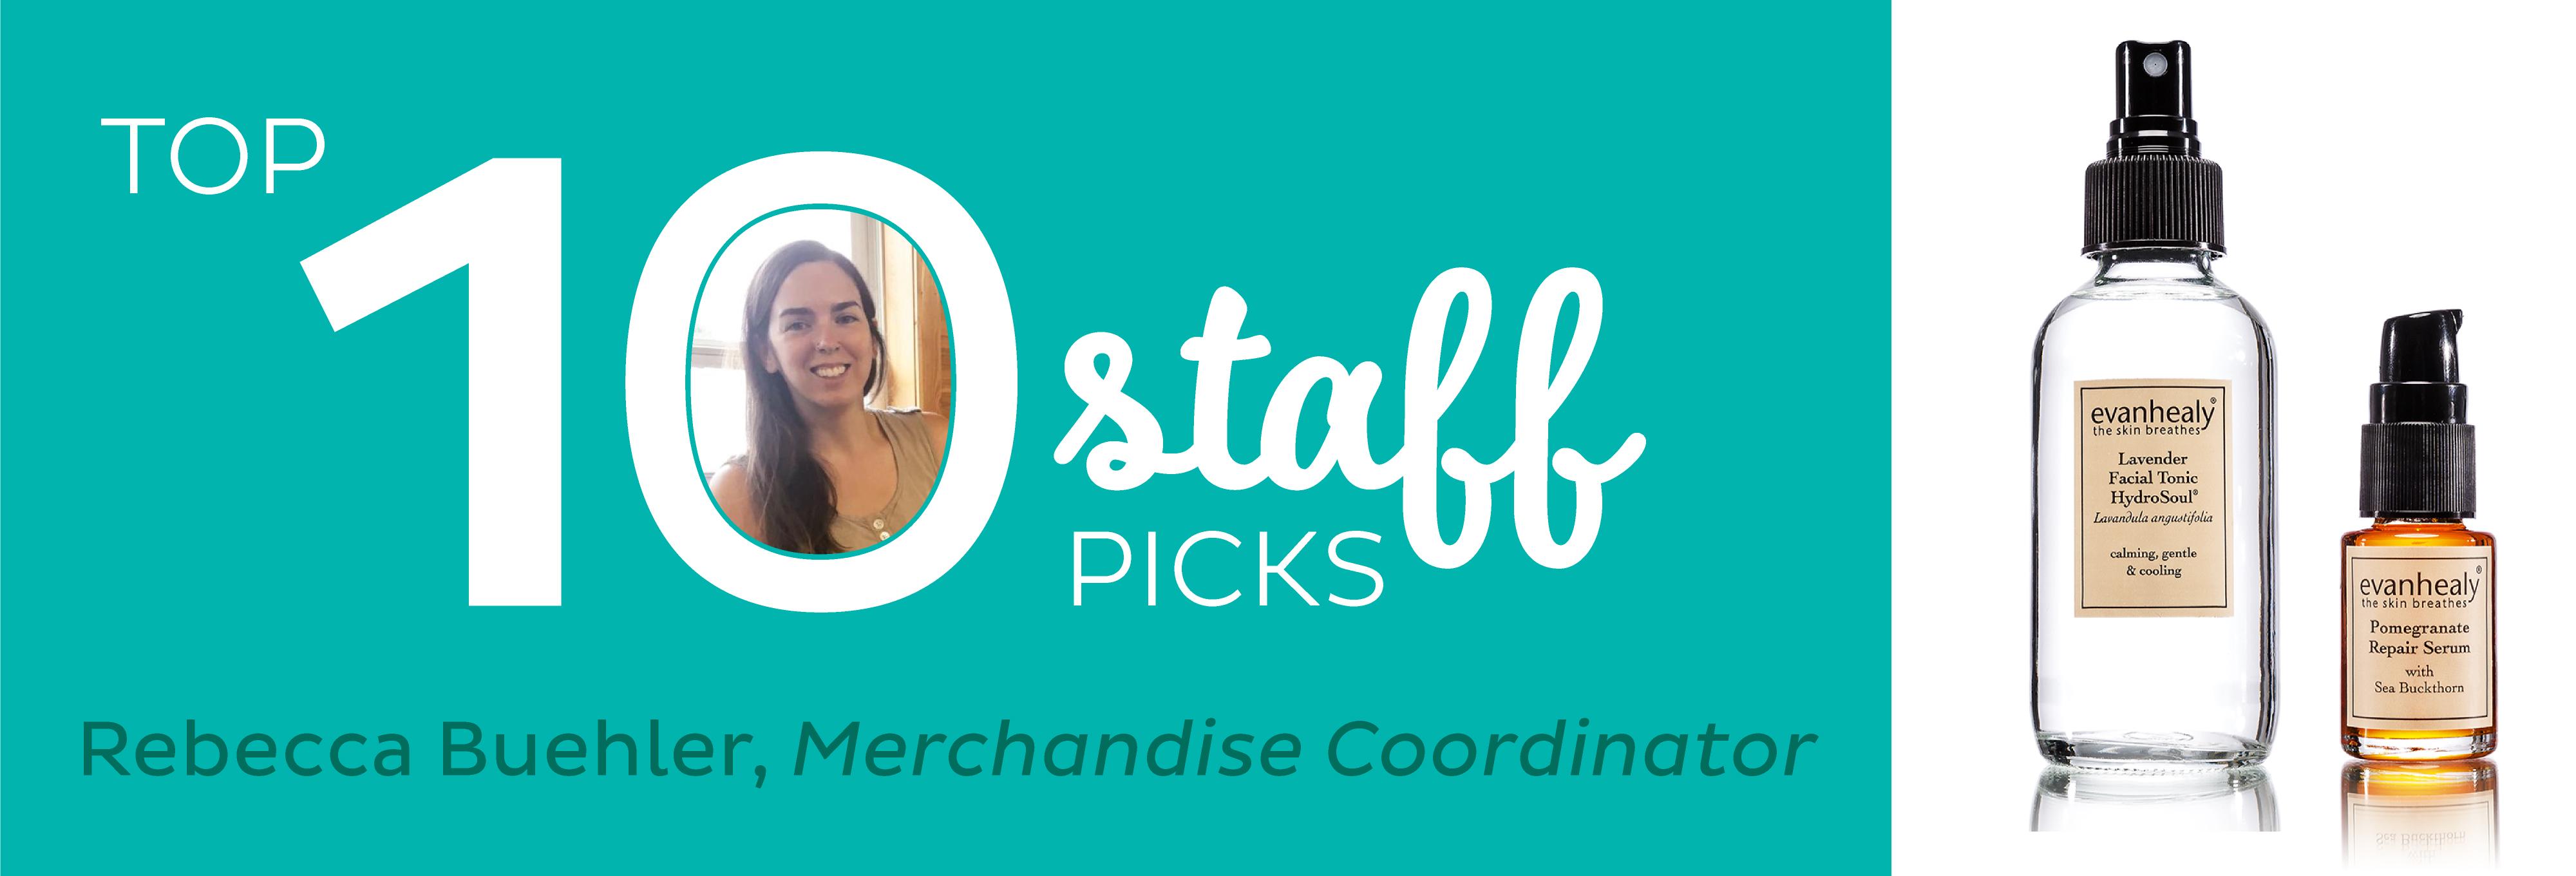 Top-10-Staff-Picks_Rebecca